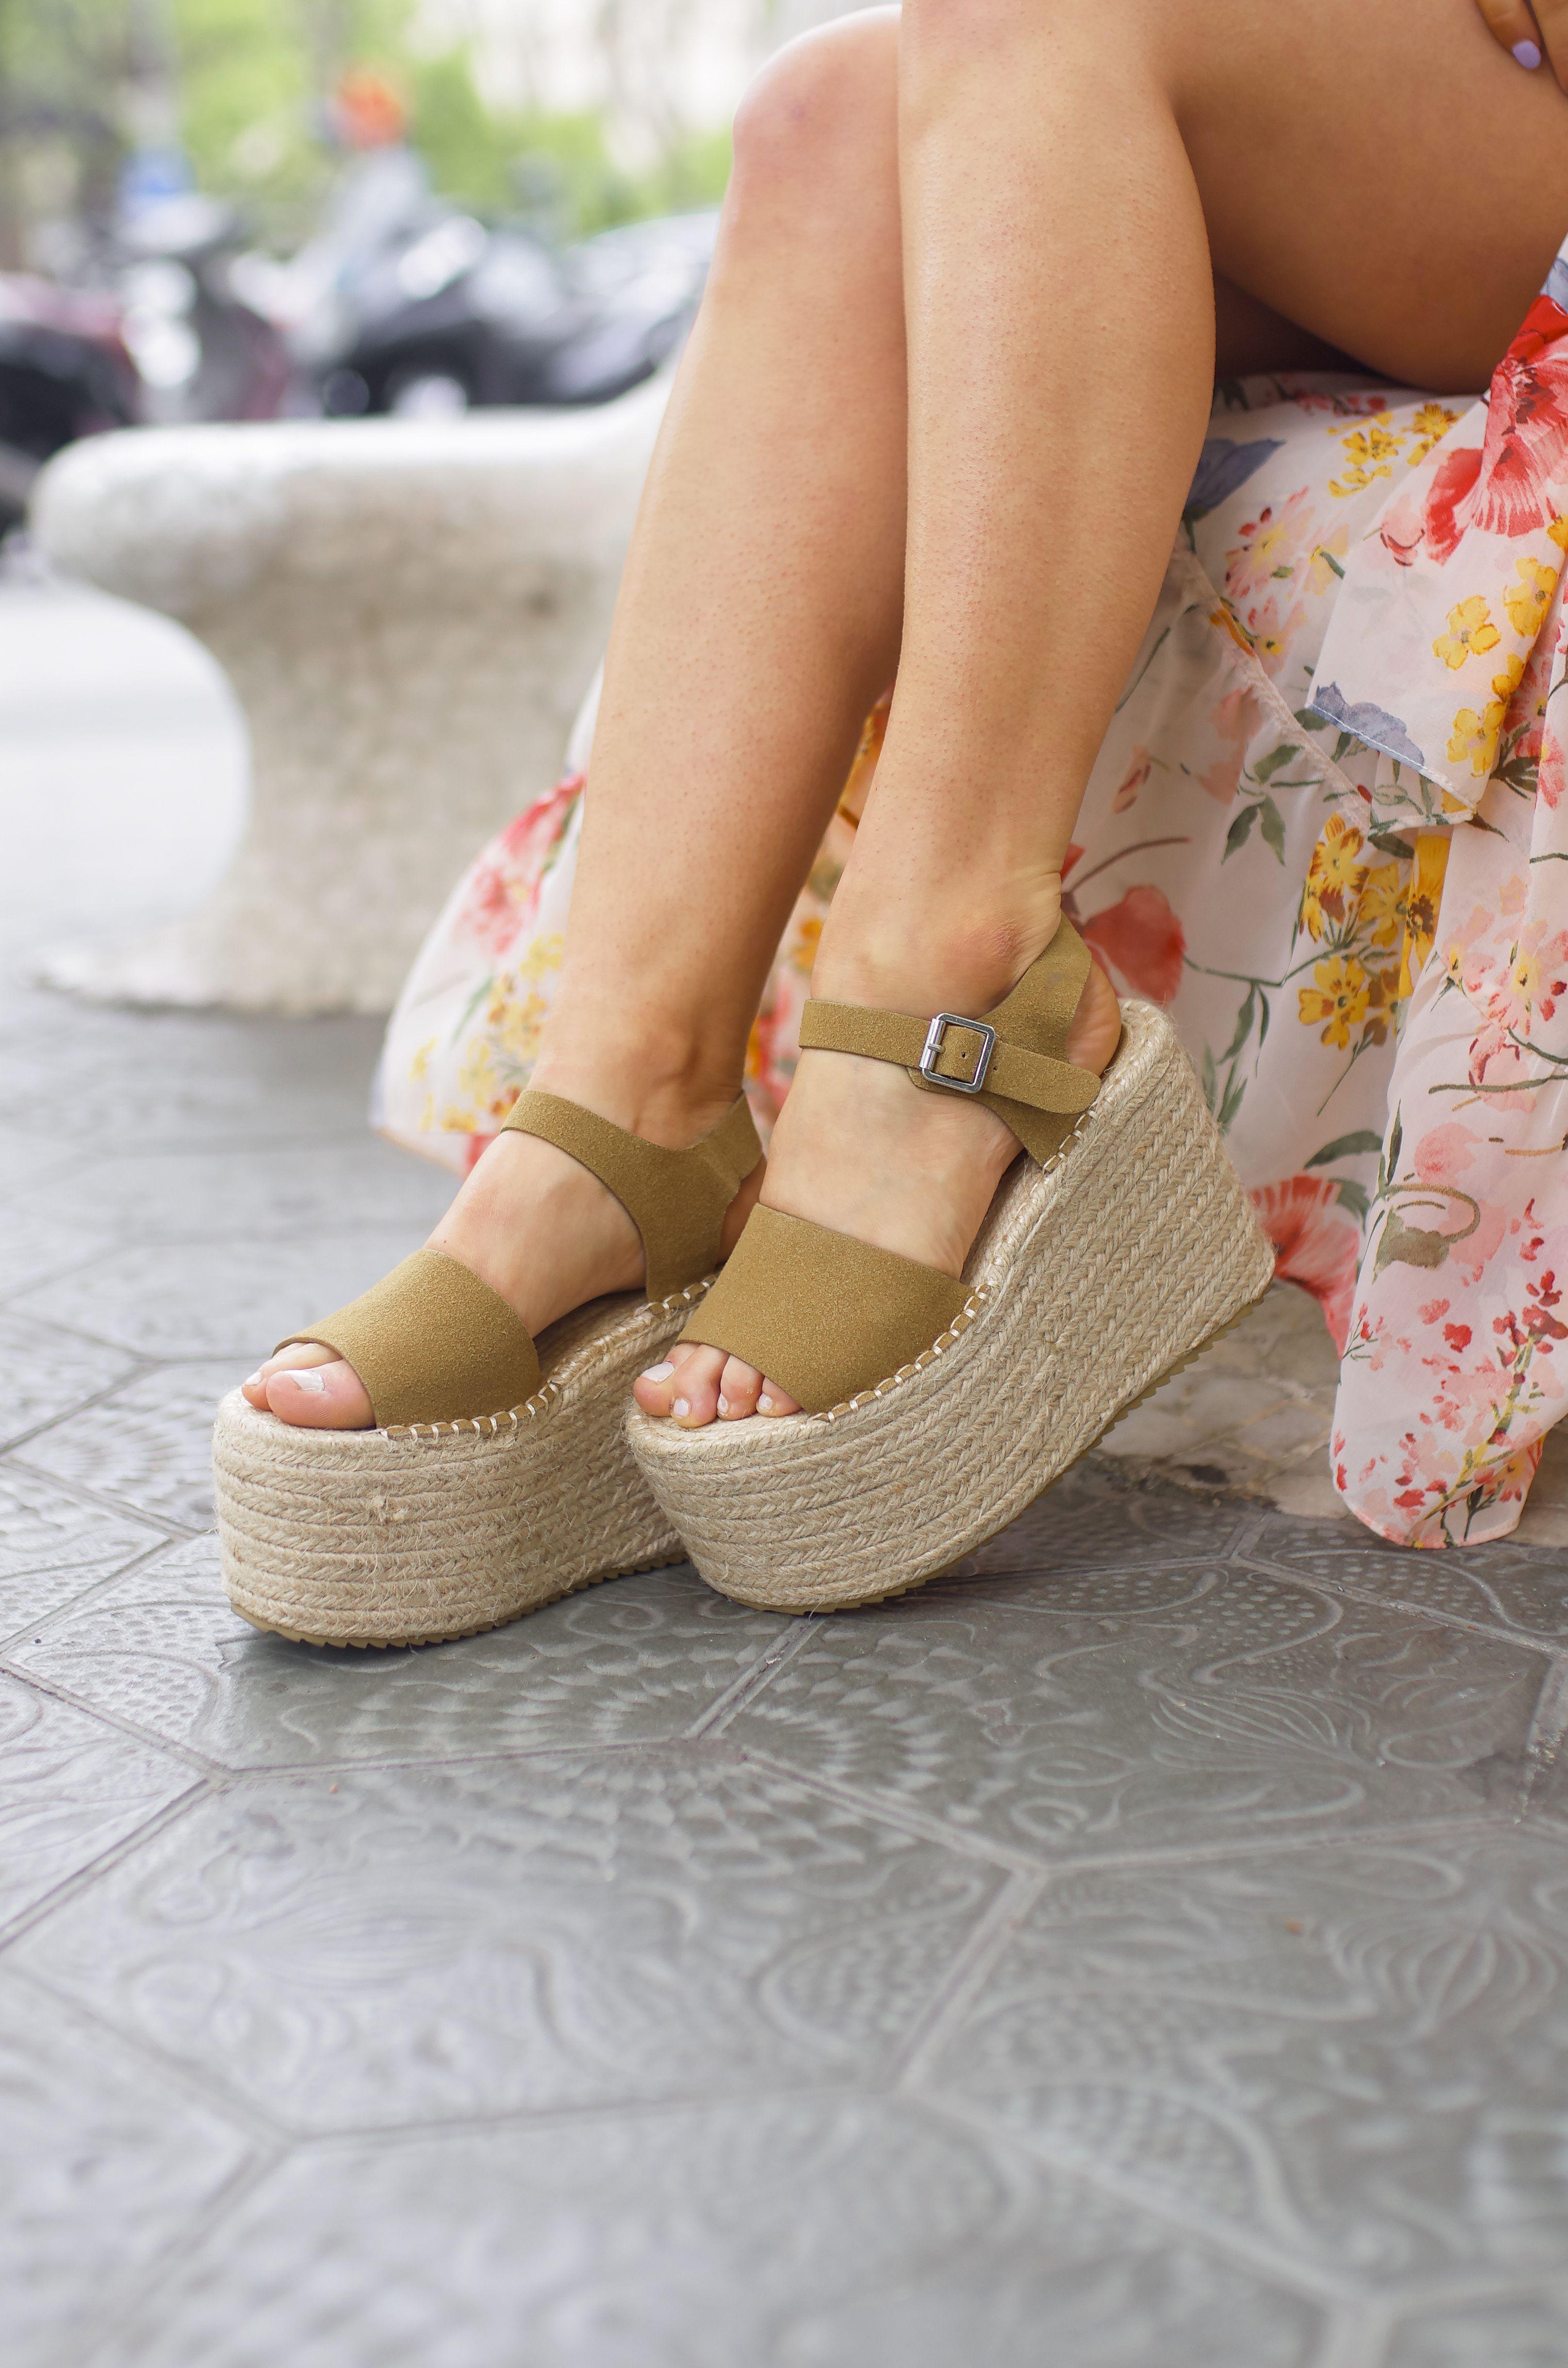 39 Sandalias Plataforma Maxi Zapatos De Verano Mujer Sandalias Plataforma Zapatos Mujer Plataforma